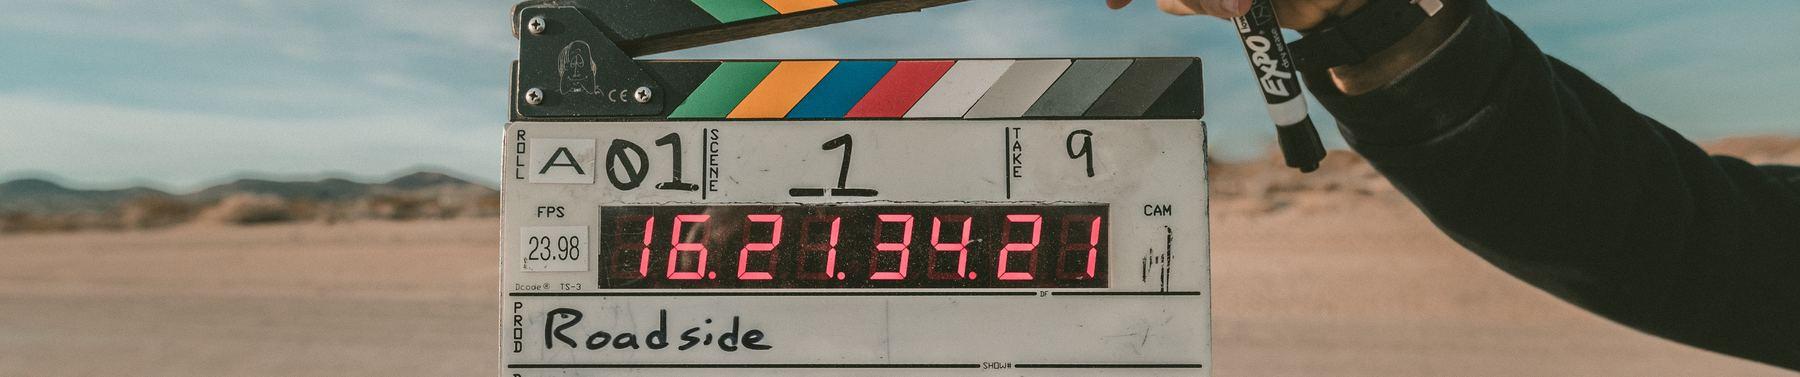 TMDb Movies Dataset | Kaggle